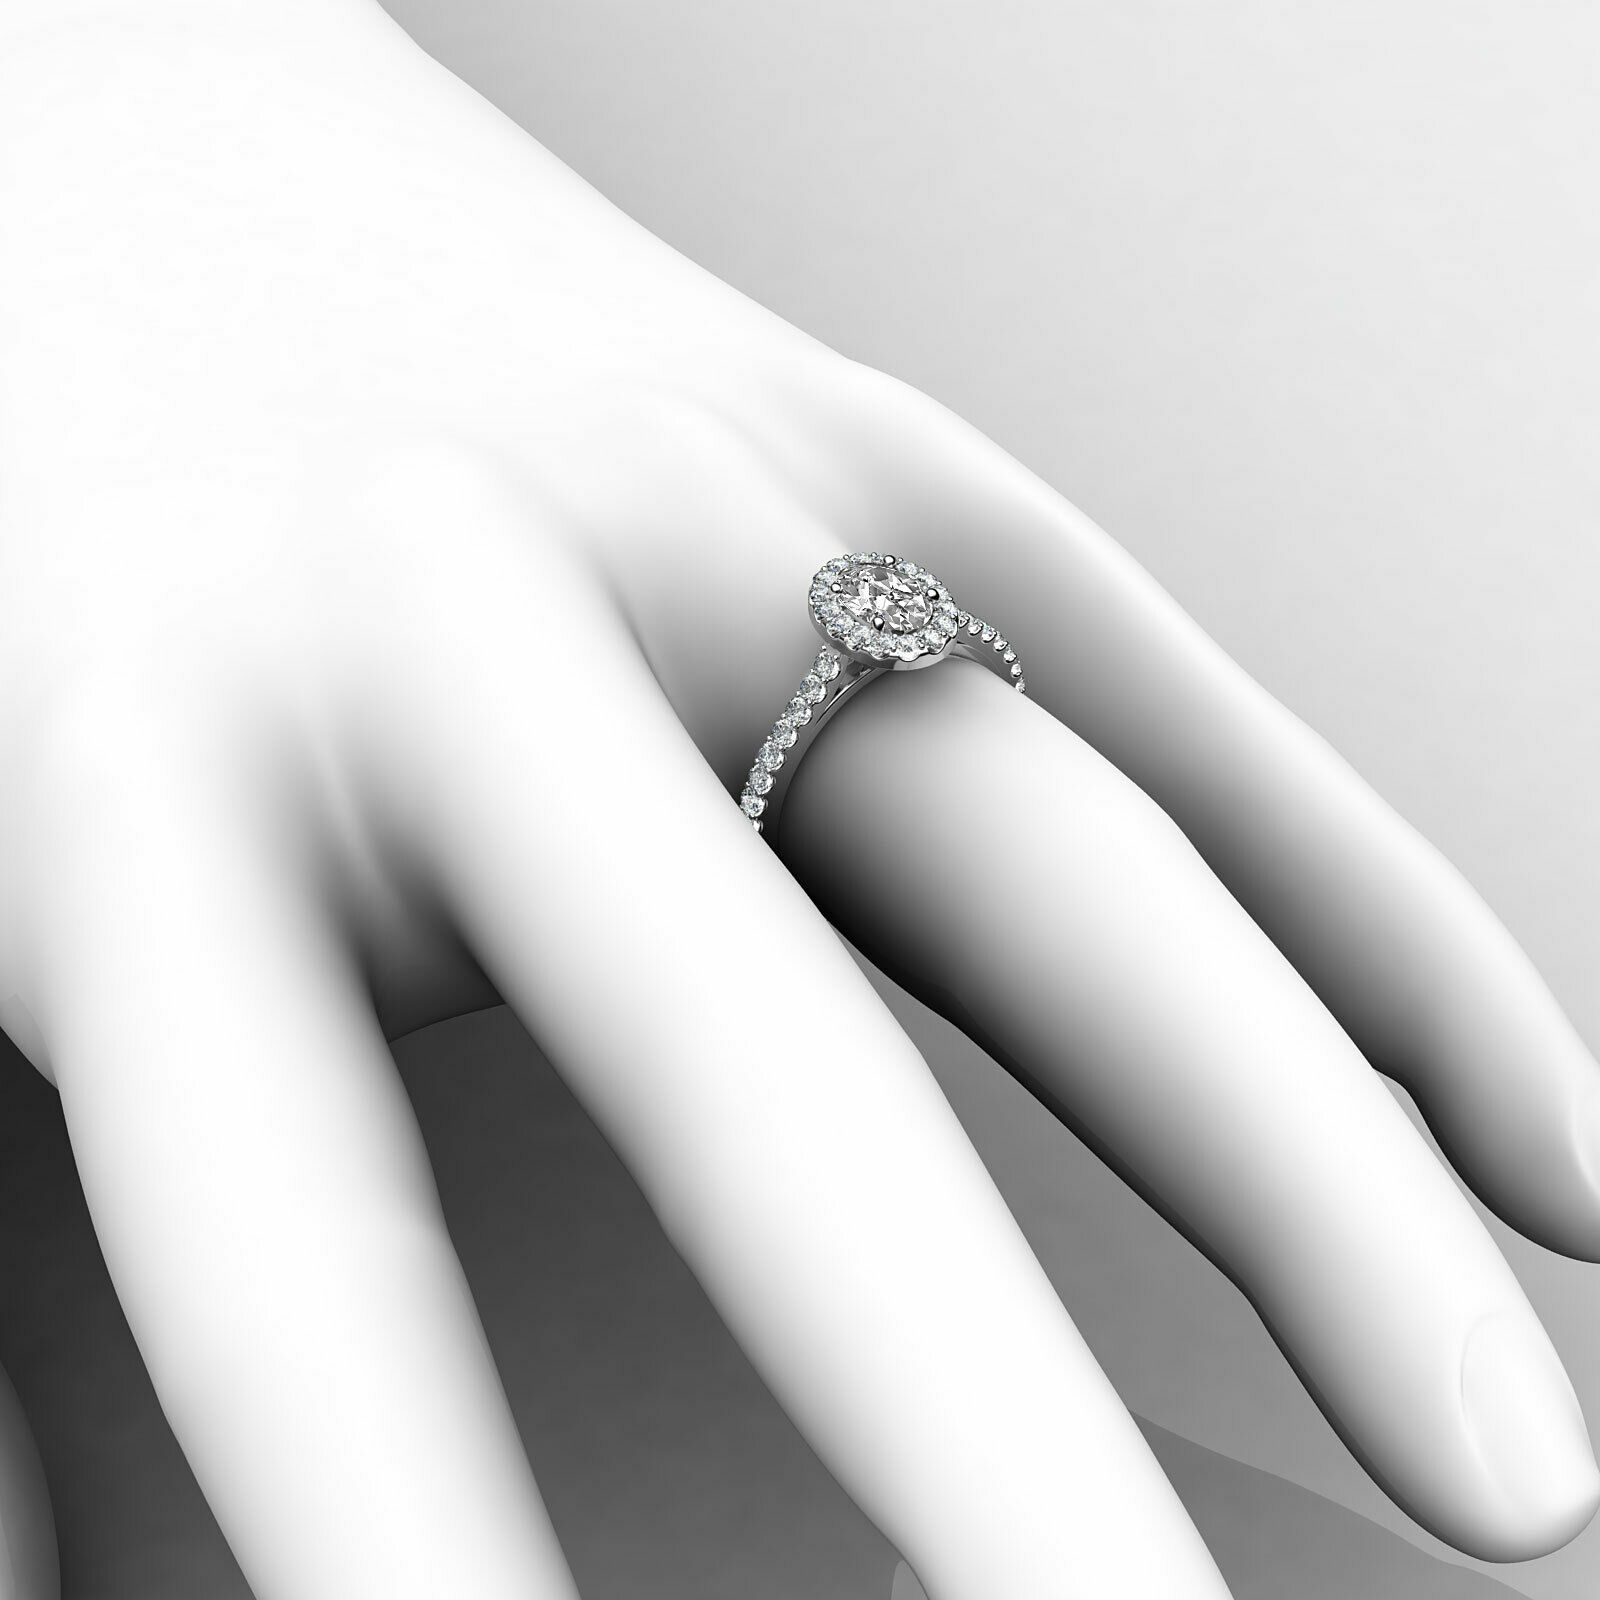 1.6ctw Prong Setting Oval Diamond Engagement Ring GIA H-VS1 White Gold Women New 6